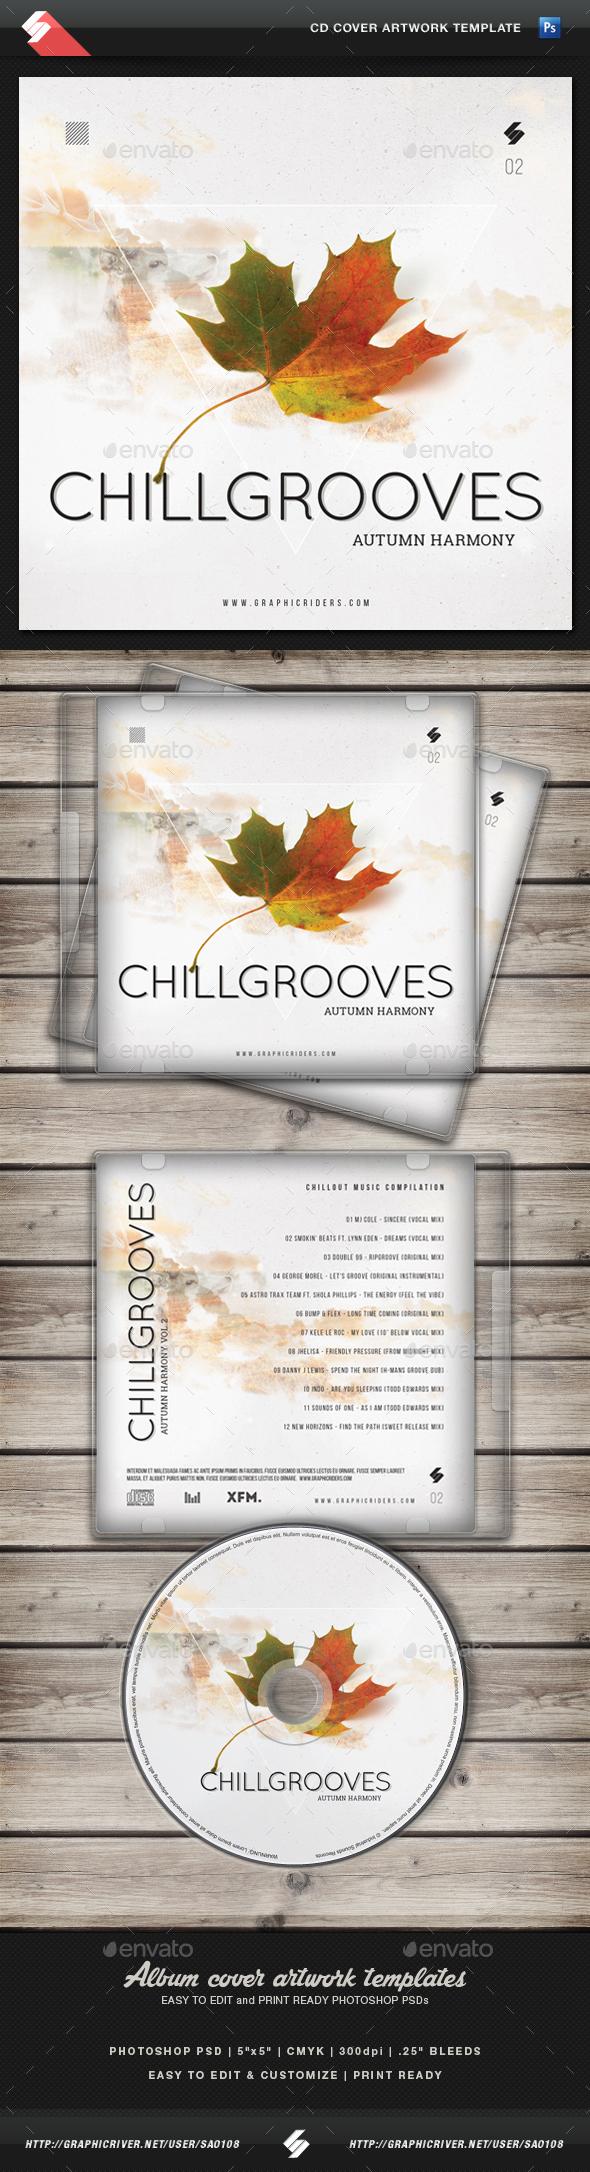 Chill Grooves 2 - CD Cover Artwork Template - CD & DVD Artwork Print Templates